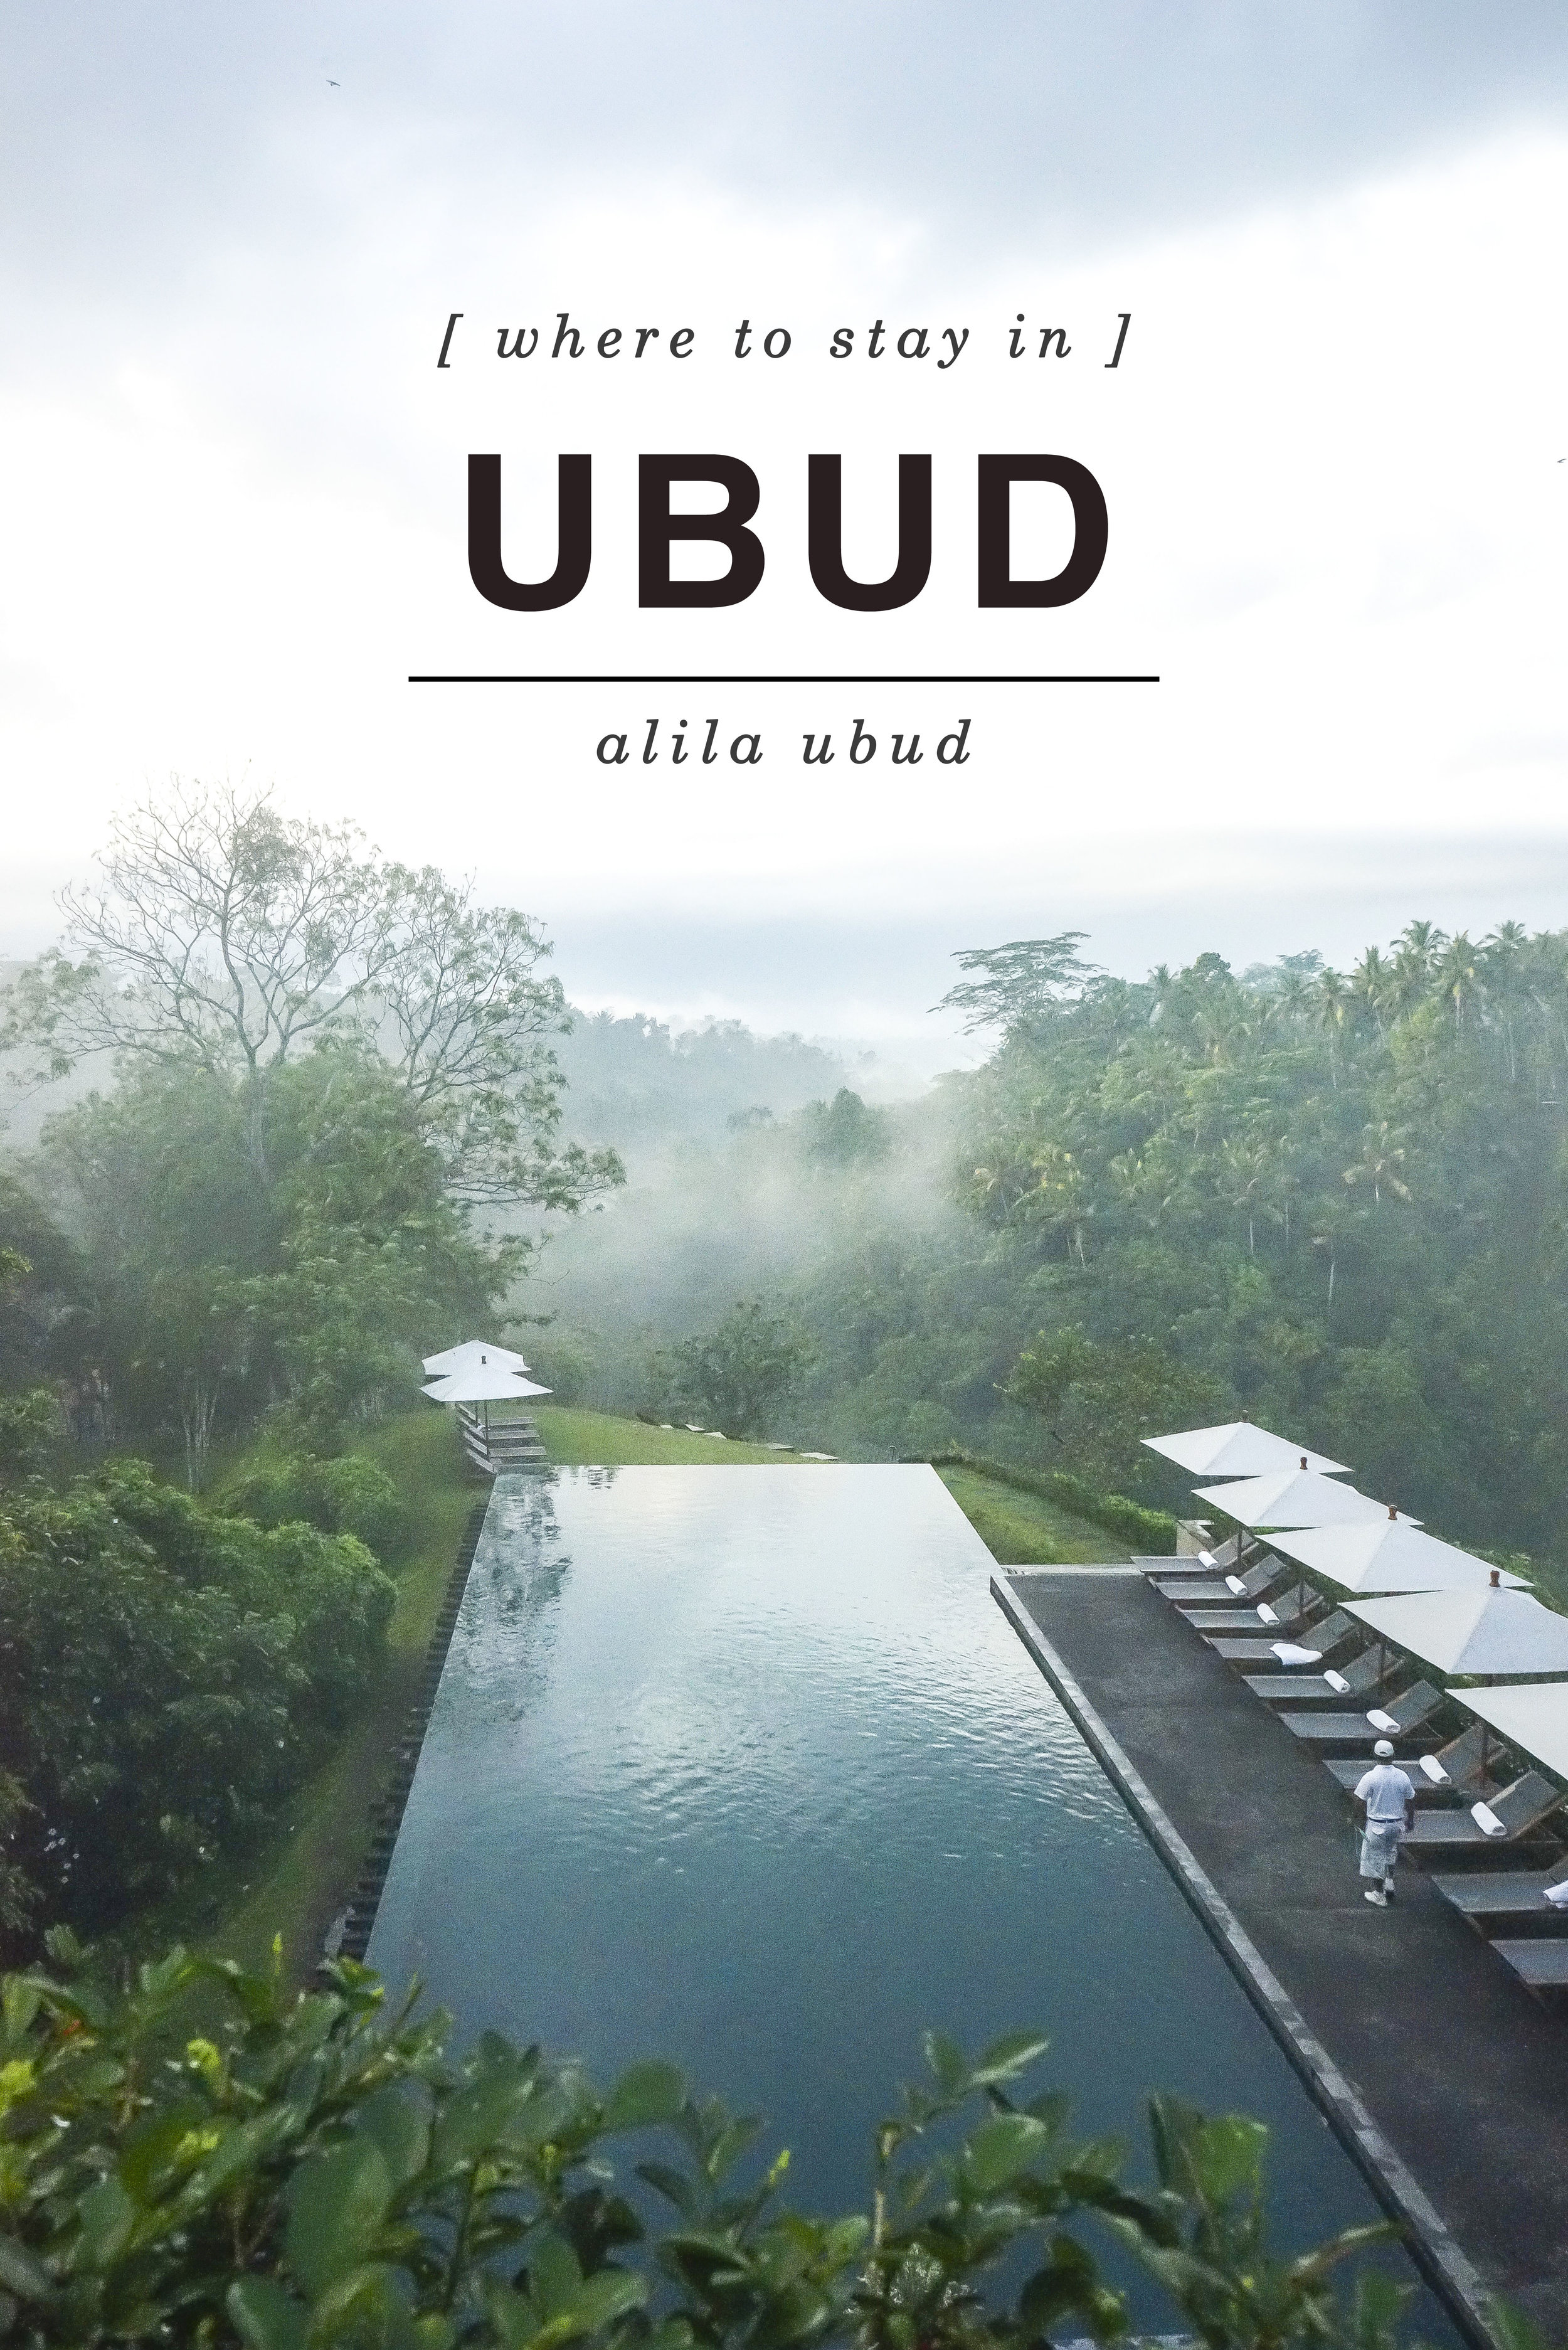 Alila_Ubud.jpg